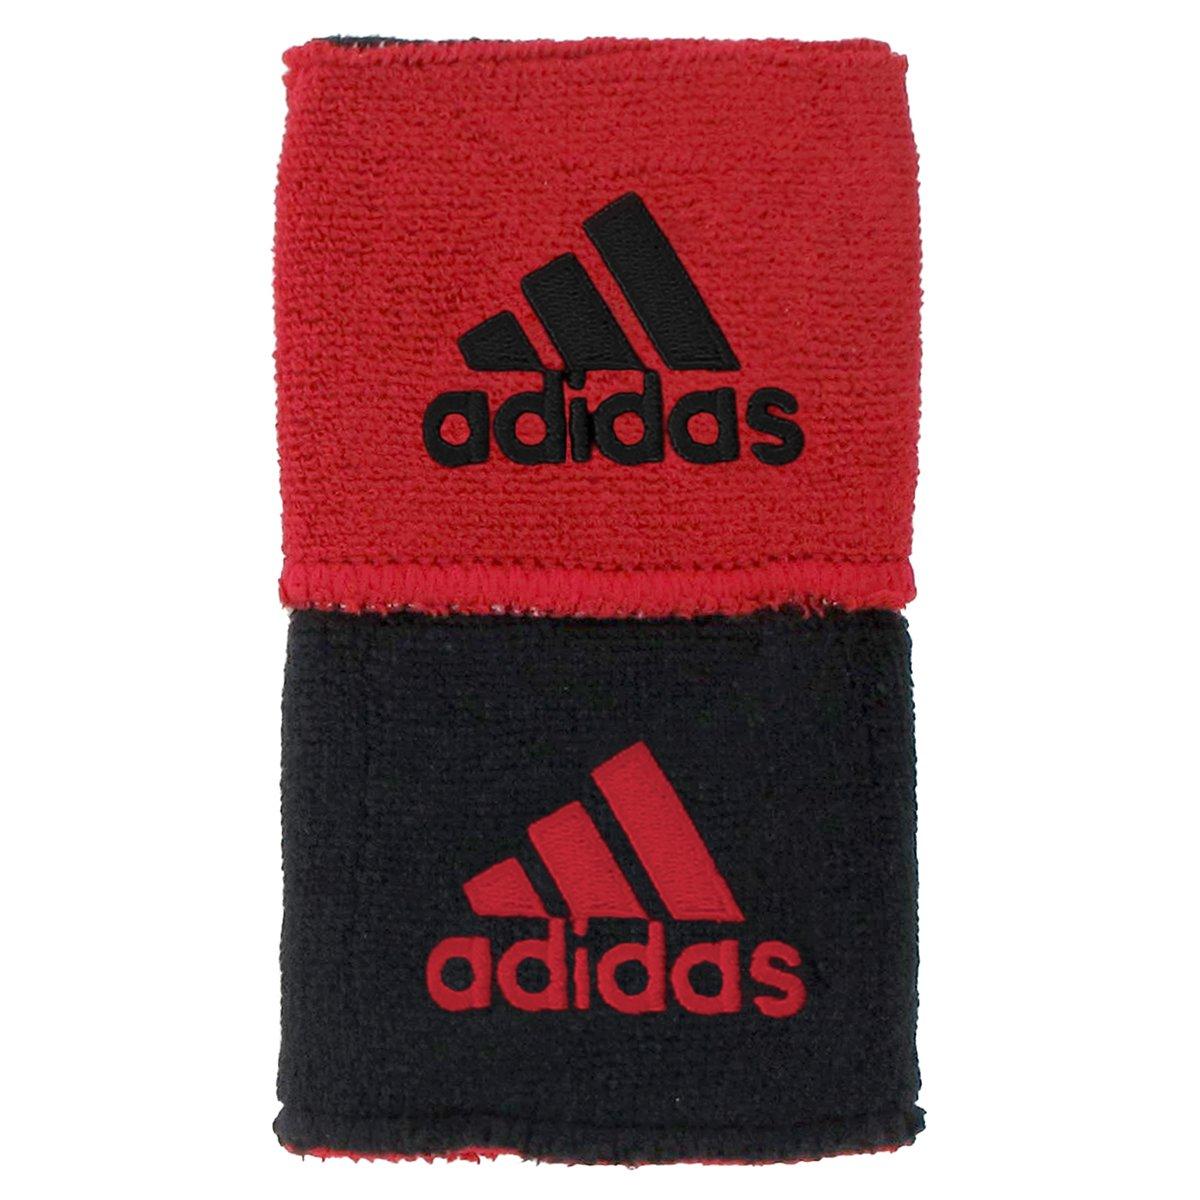 adidas Interval Reversible Wristband, Black/University Red / University Red/Black, One Size Fits All